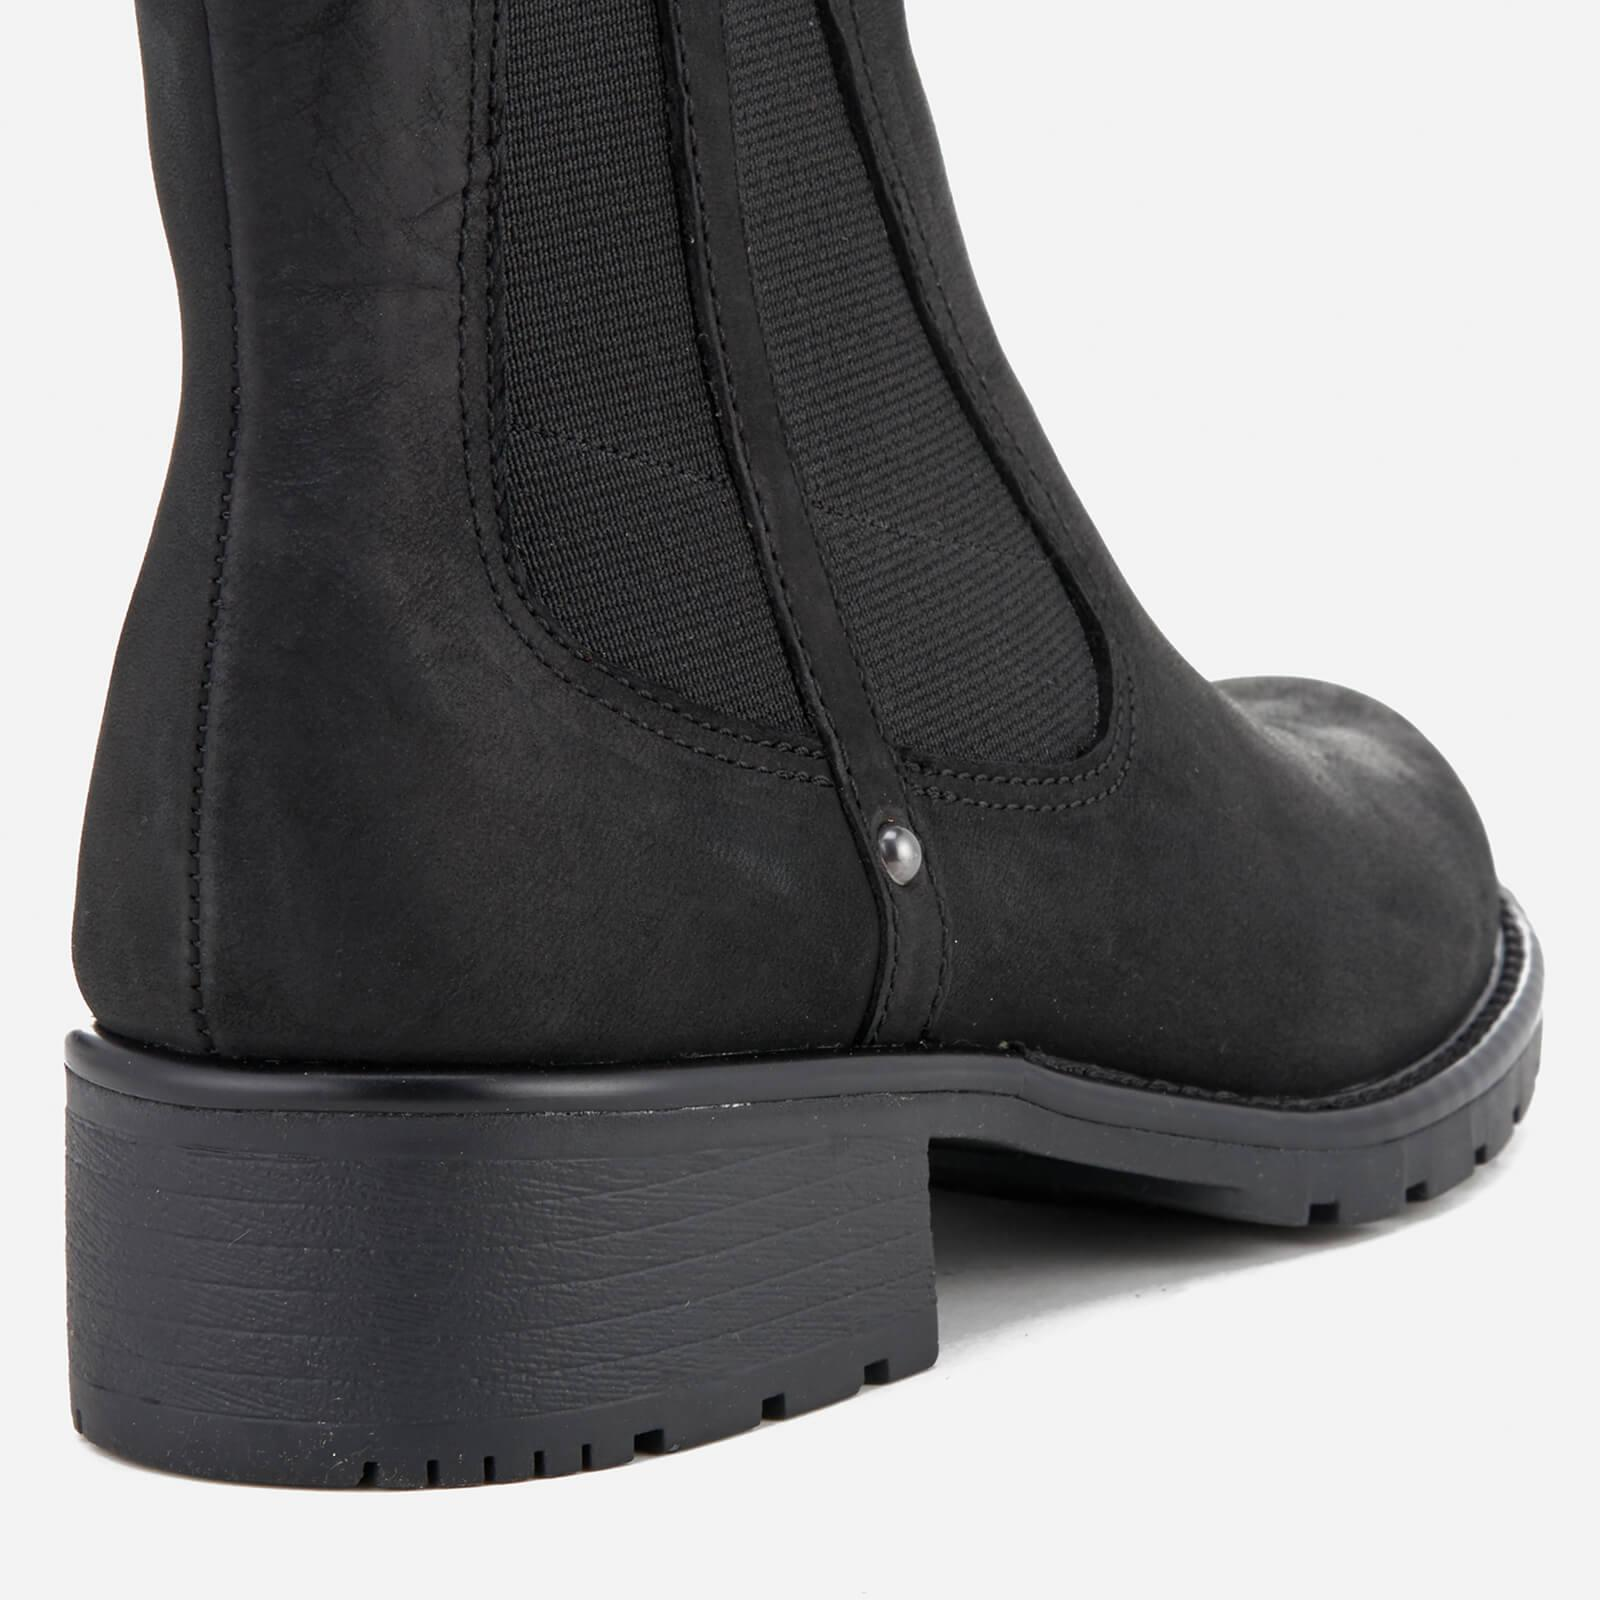 4ef3fd87e2f1 Clarks - Black Women s Orinoco Club Leather Chelsea Boots - Lyst. View  fullscreen